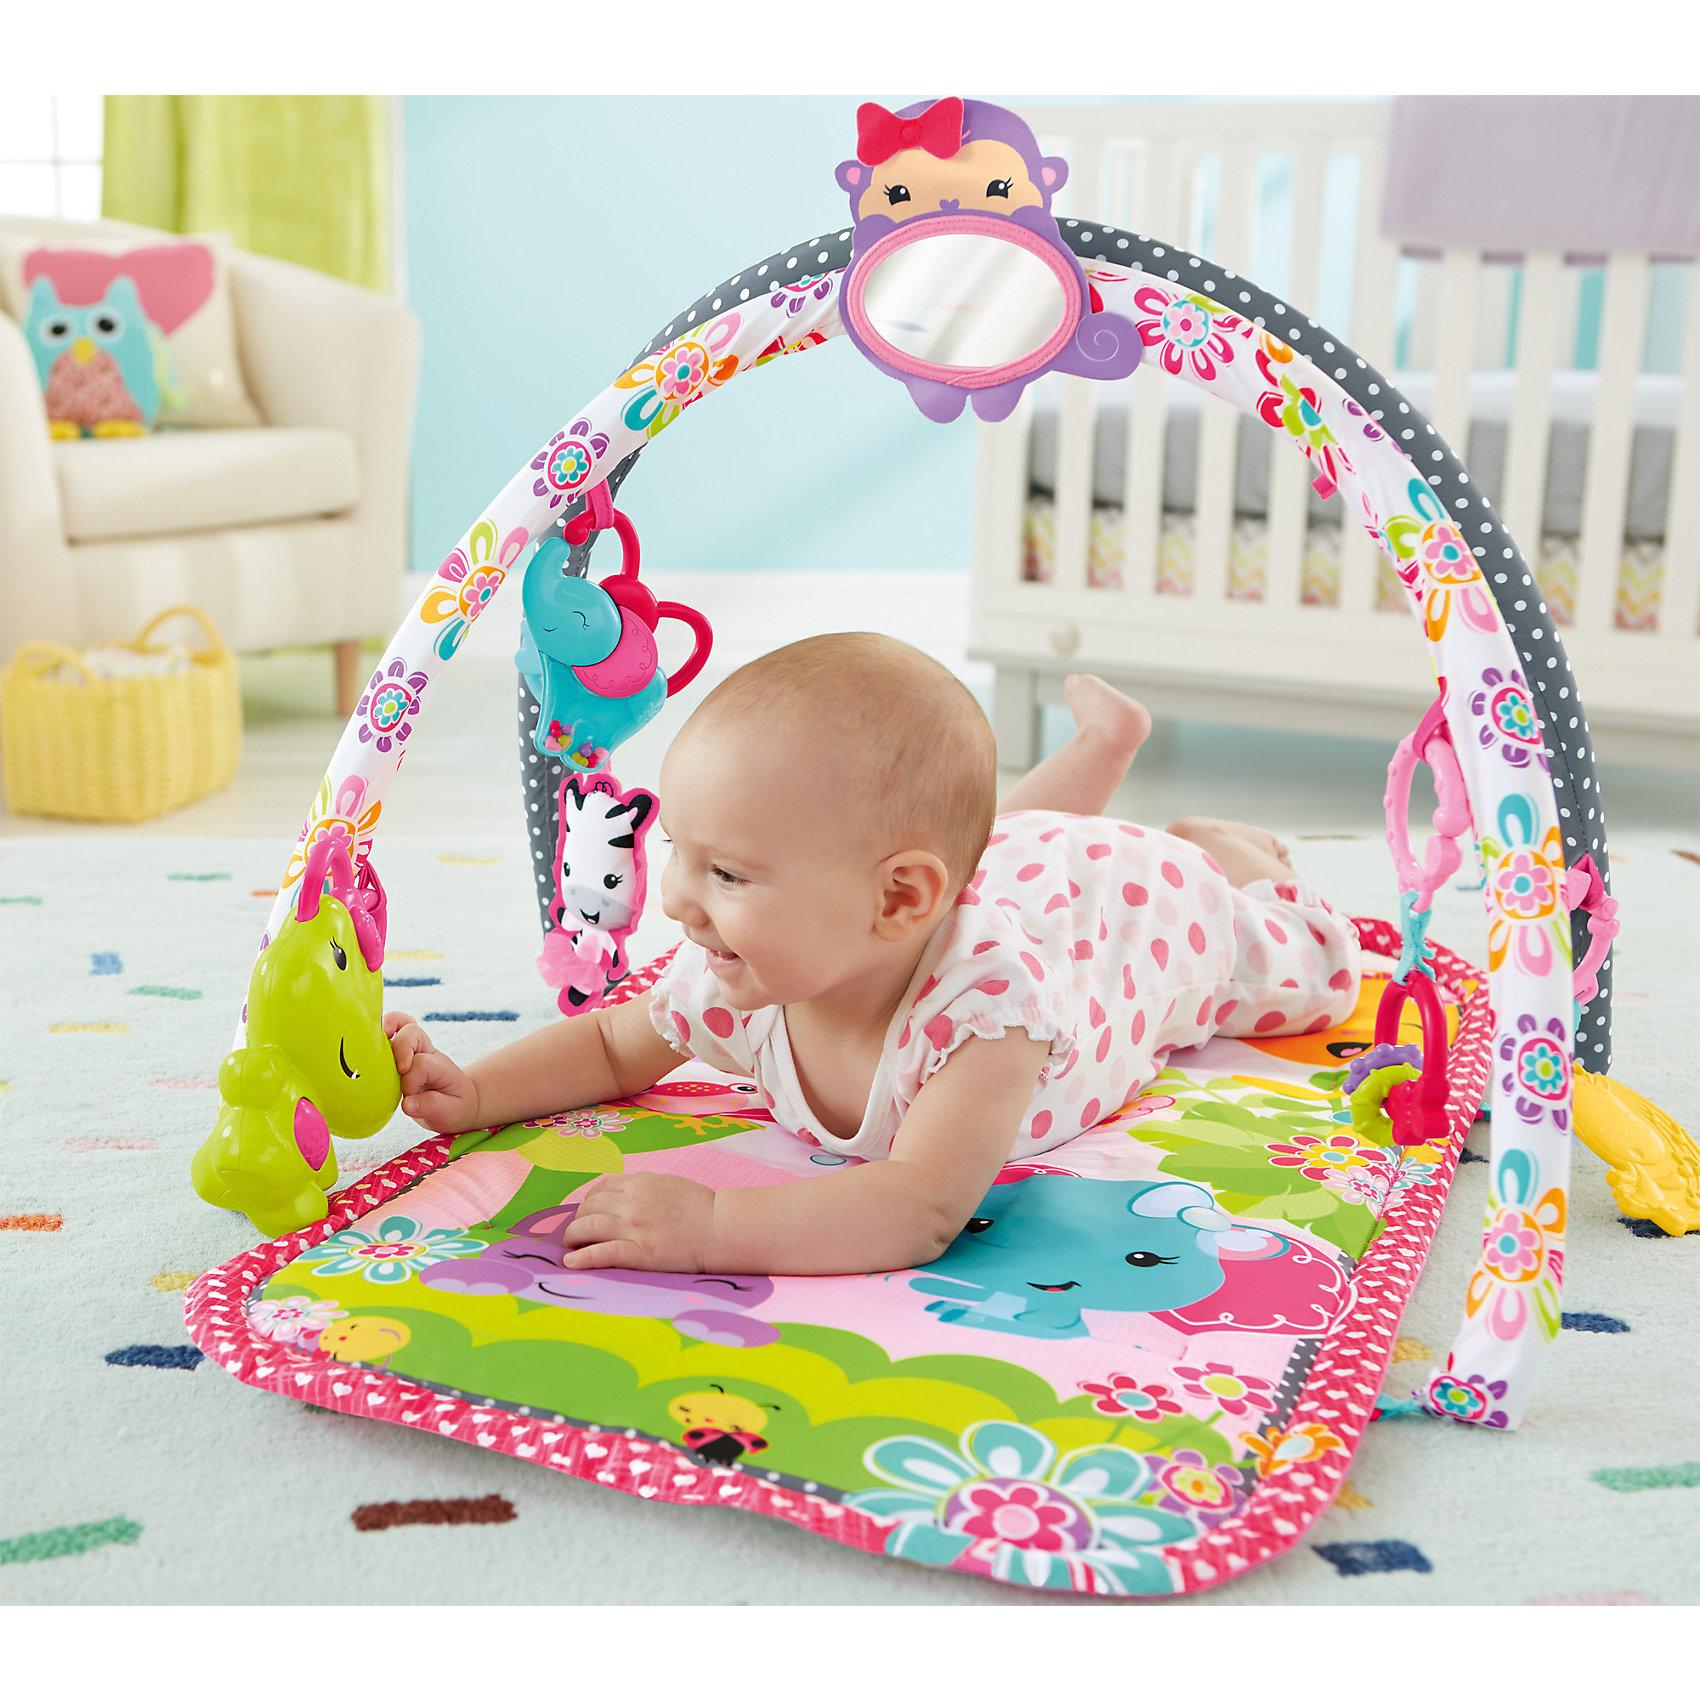 Mattel Развивающий коврик, розовый, Fisher Price цена и фото